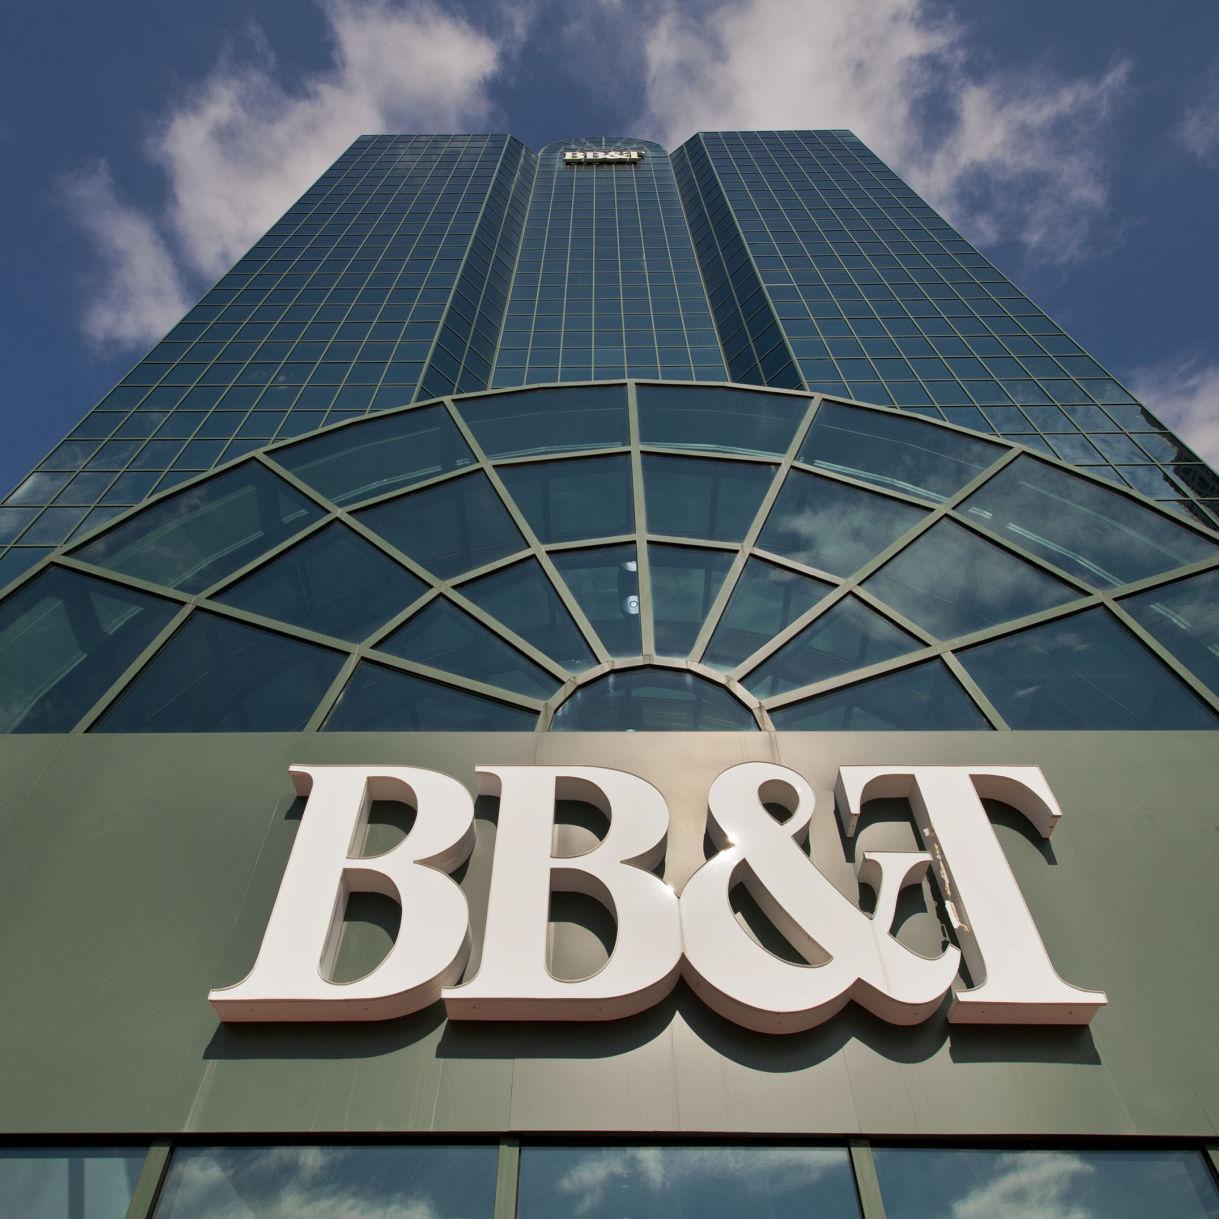 BB&T, SunTrust hire global marketing firm to create merged